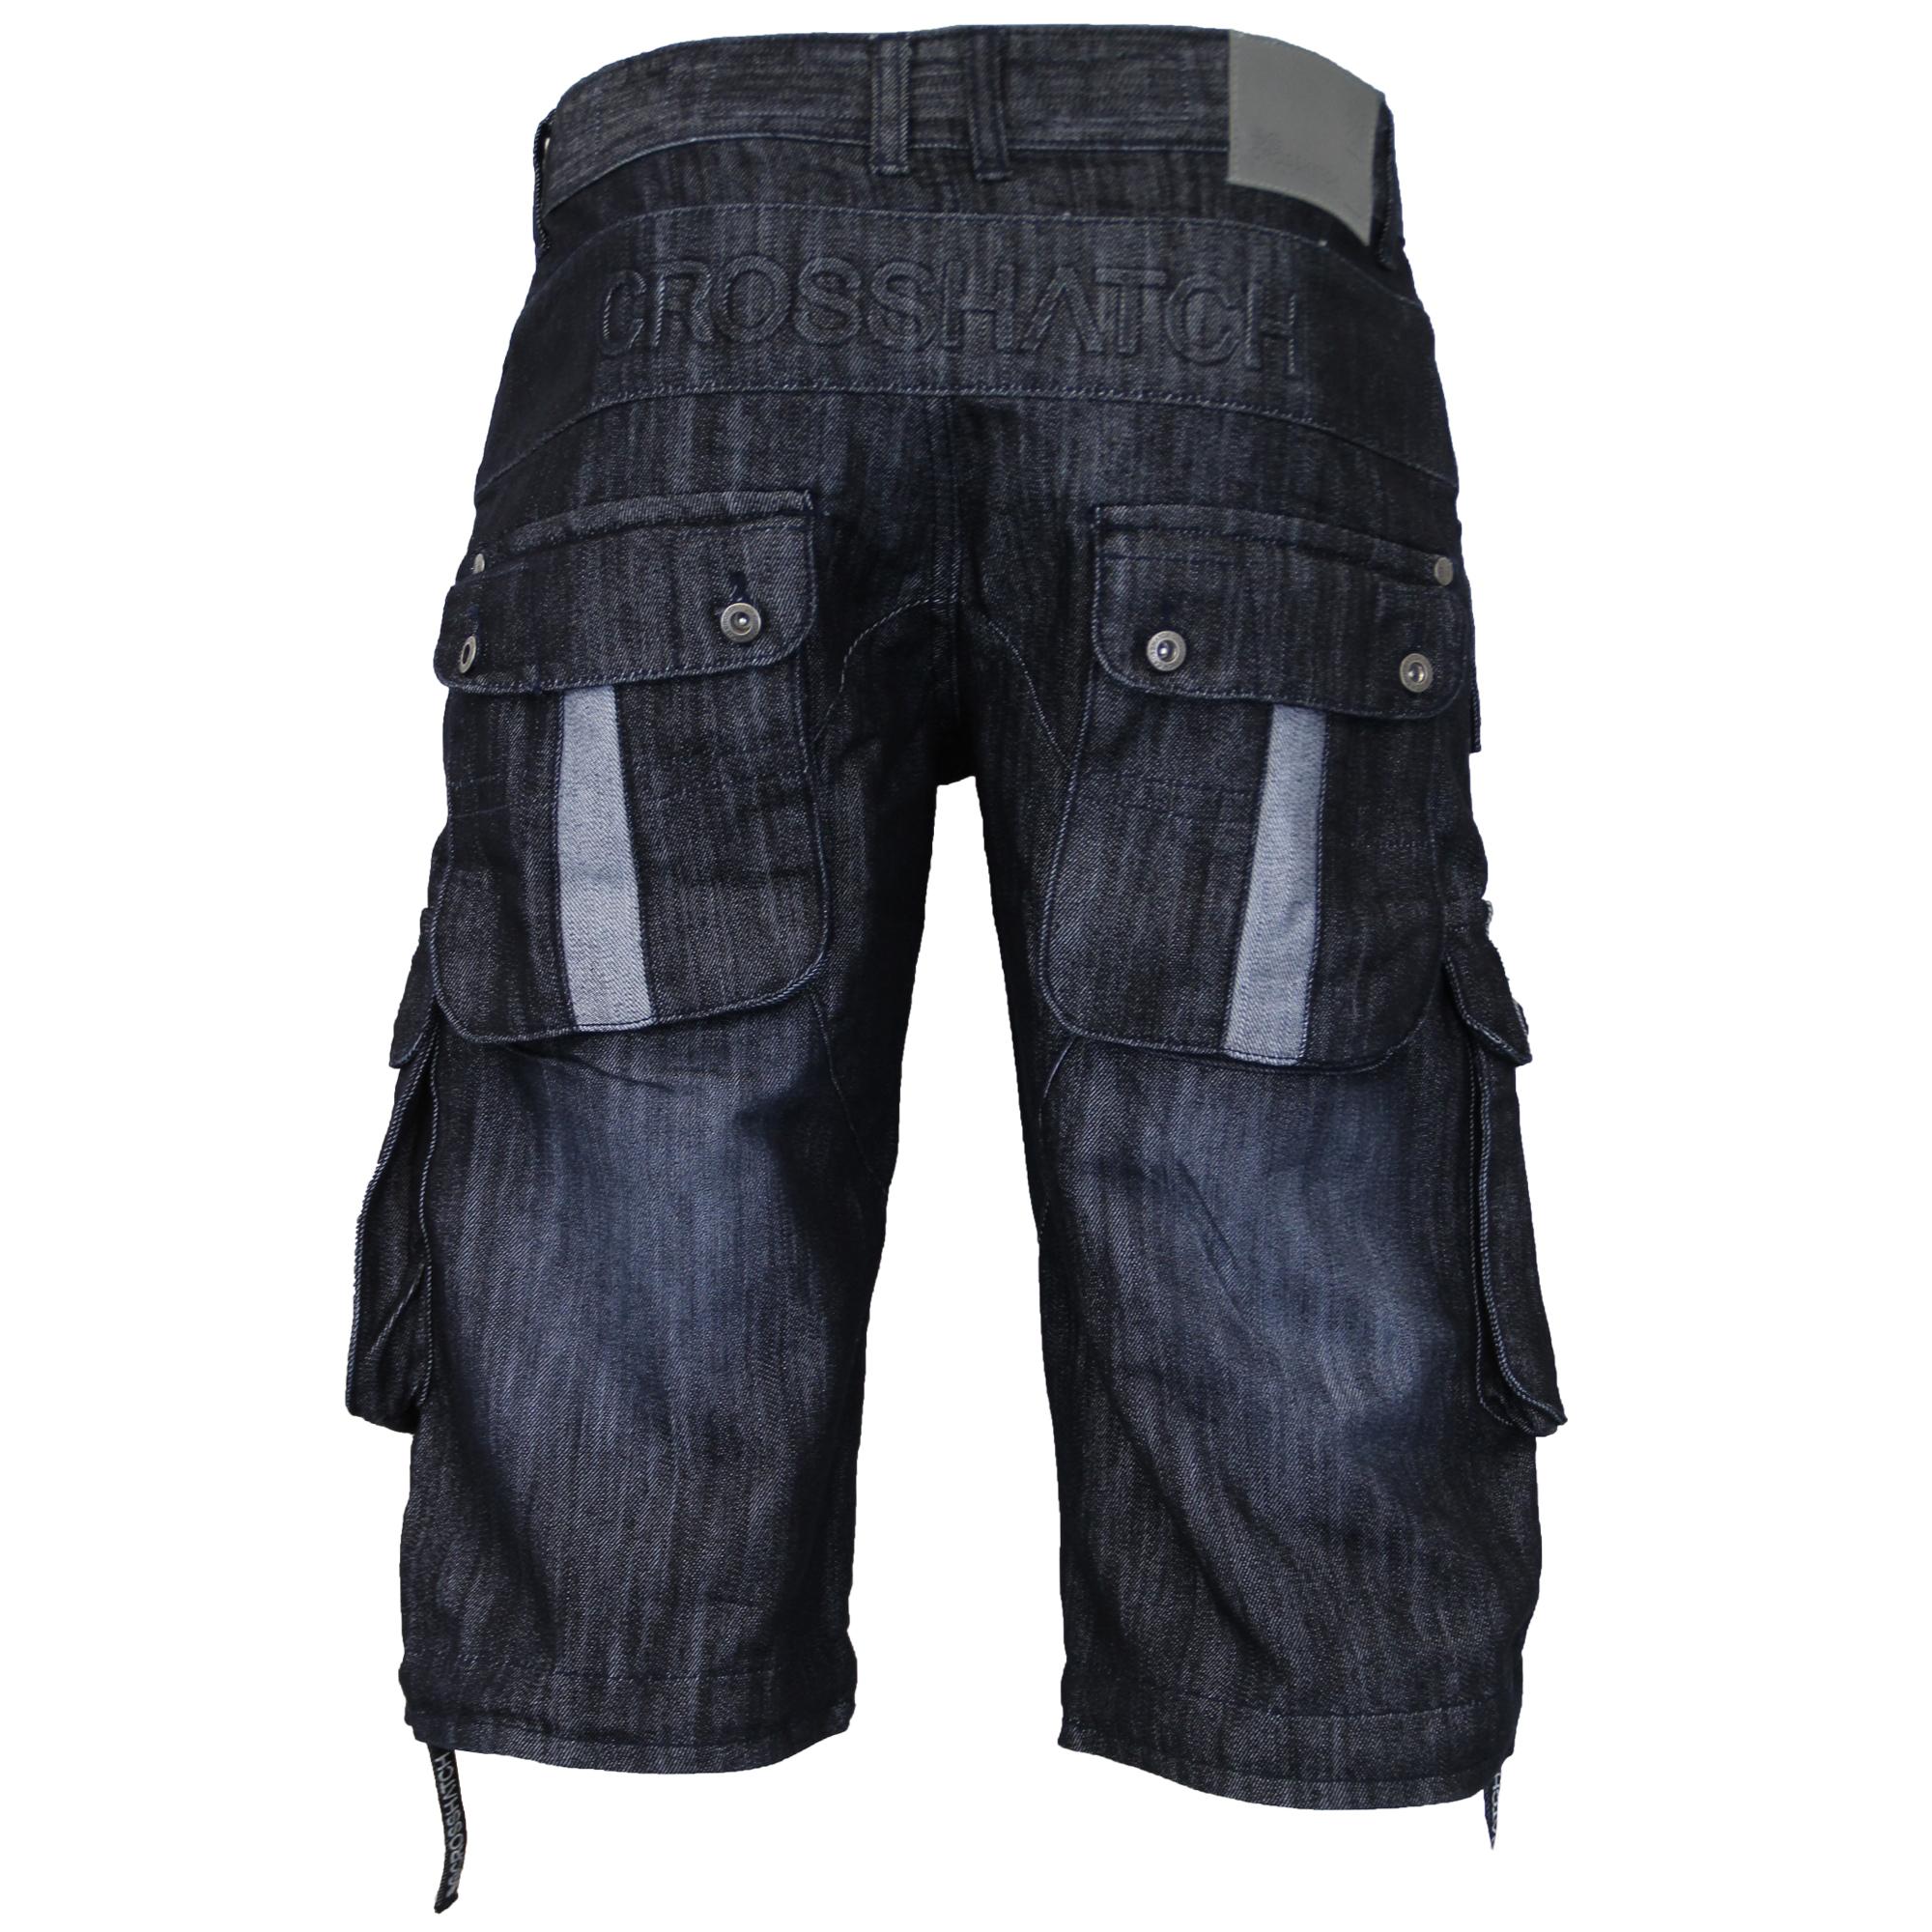 Mens-Denim-Knee-Length-Combat-Shorts-By-Crosshatch thumbnail 6